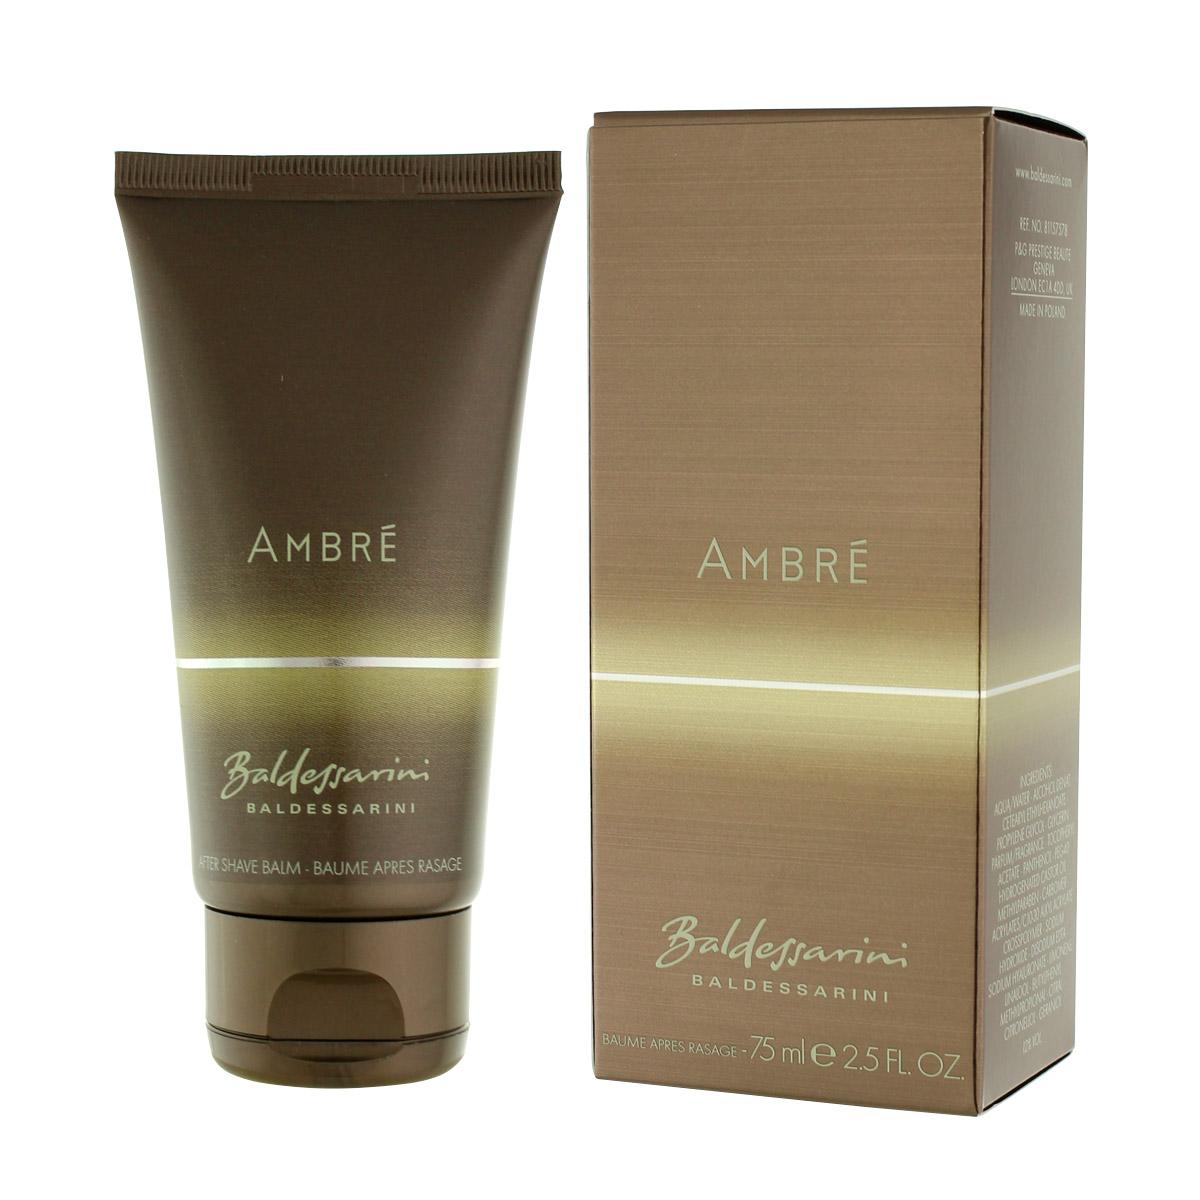 Baldessarini Ambre Aftershave 75ml